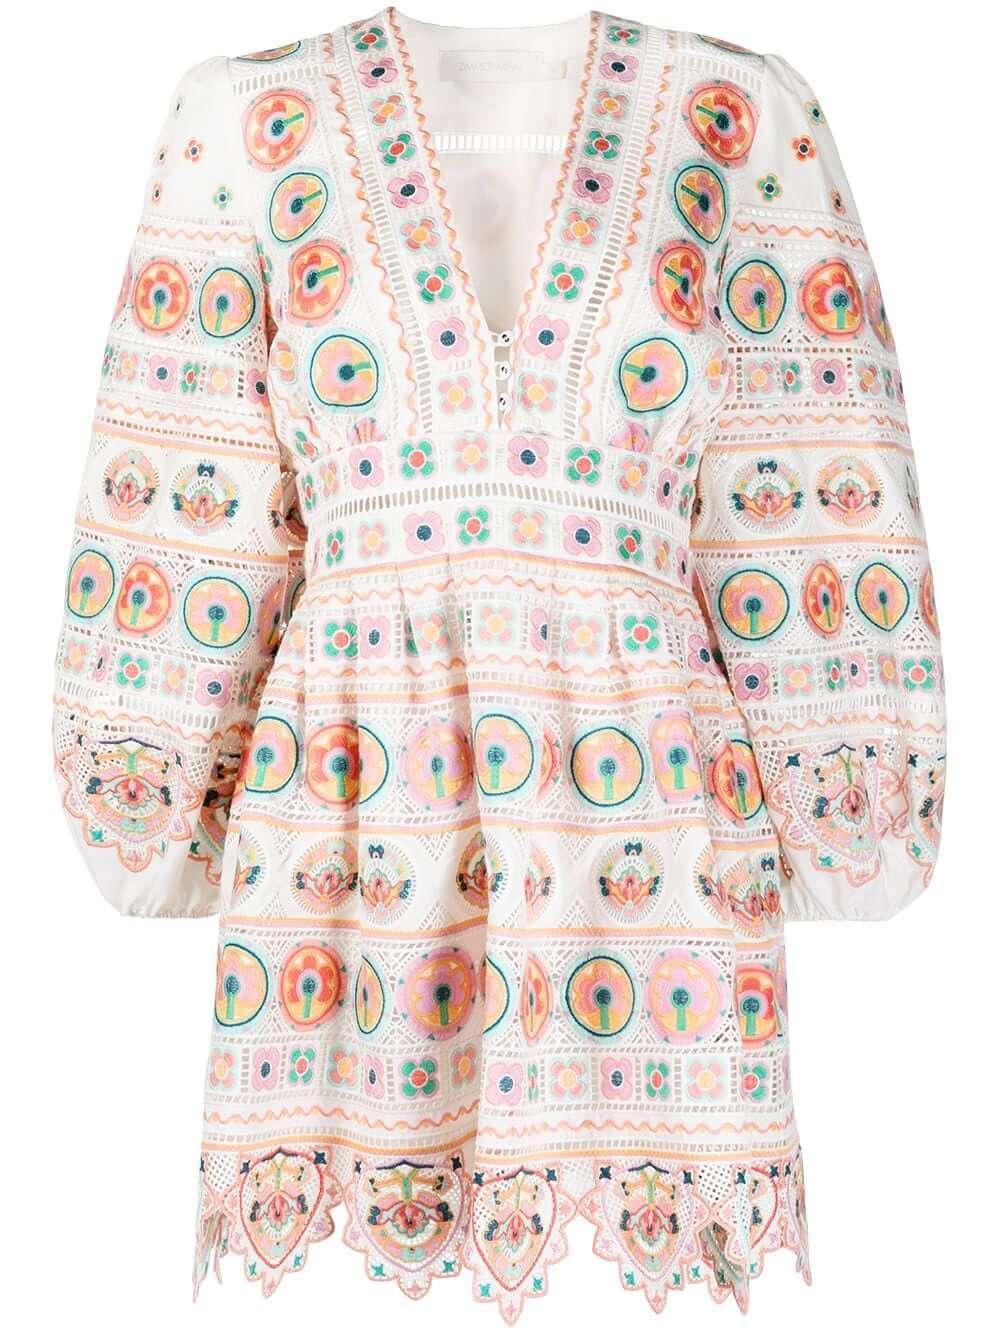 Brighton Plunge Dress Item # 9351DBRG